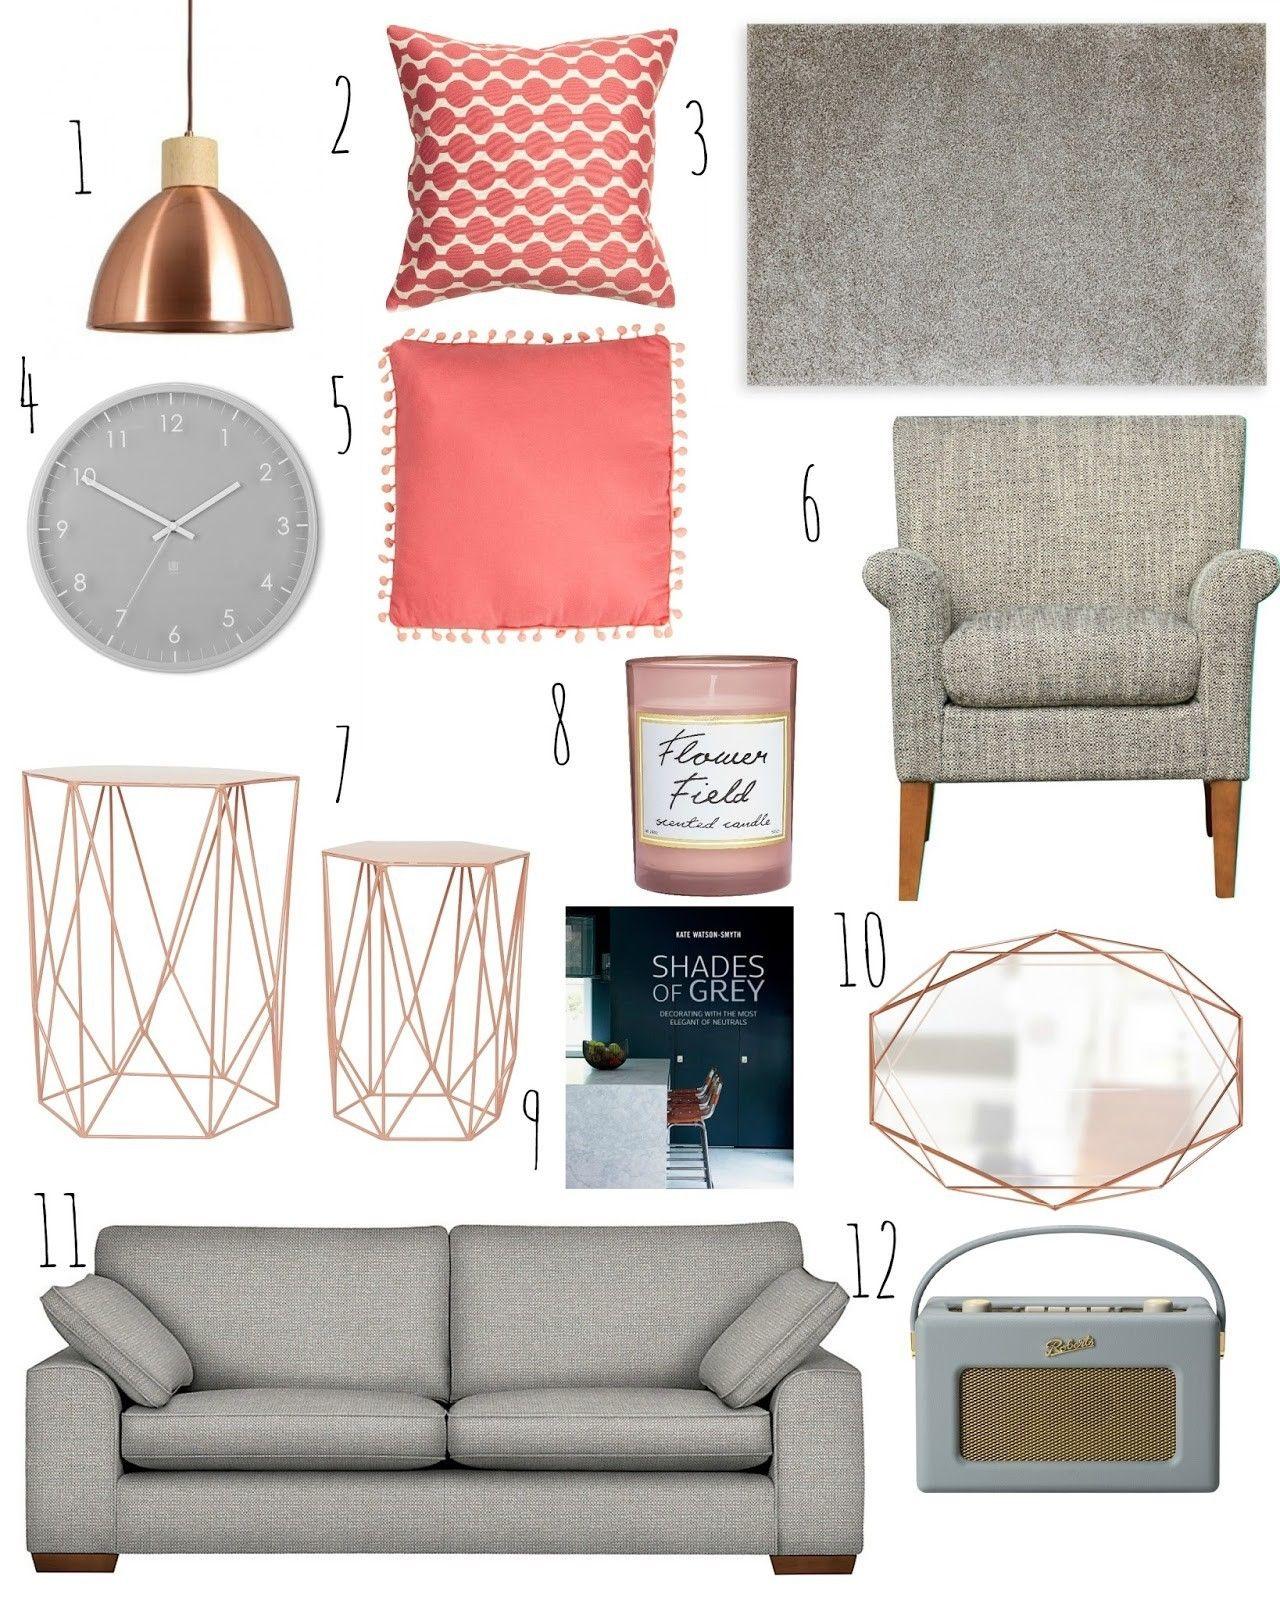 Pin von Simone Bennett auf rose gold & grey living room | Pinterest